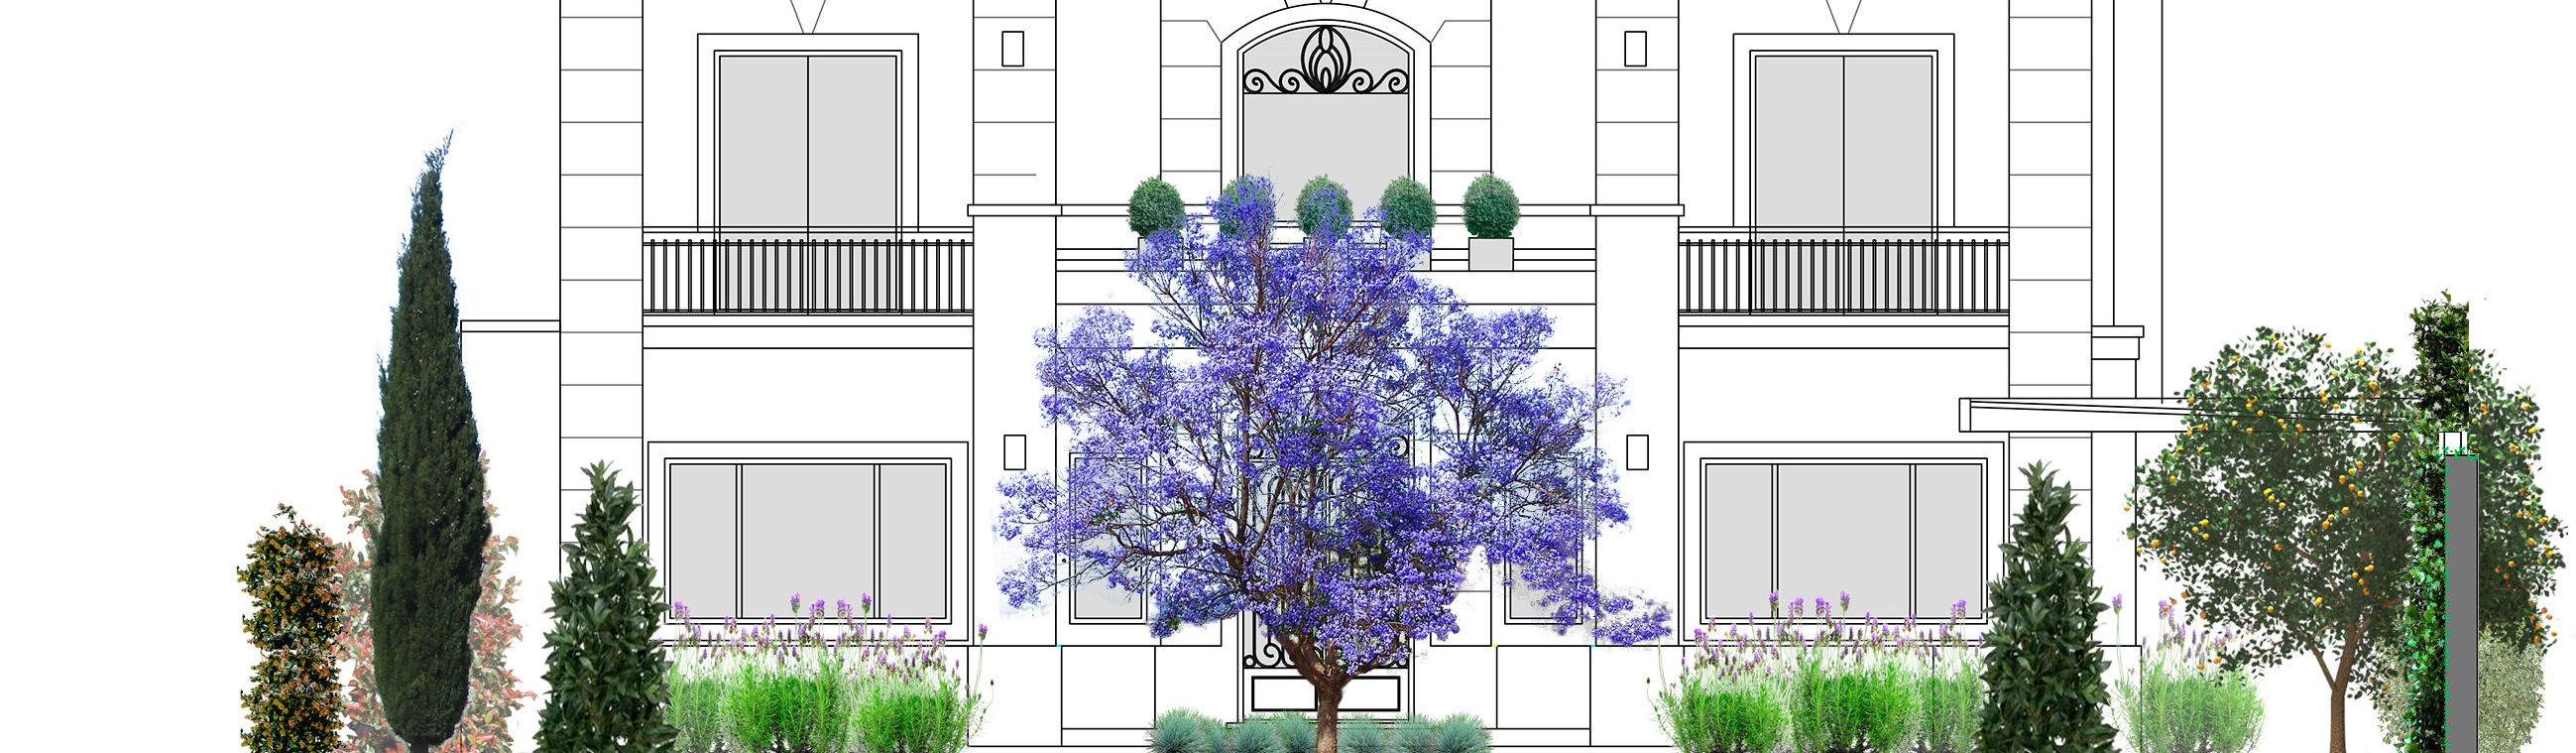 Paisajismo digital arquitectos paisajistas en barcelona - Paisajismo barcelona ...